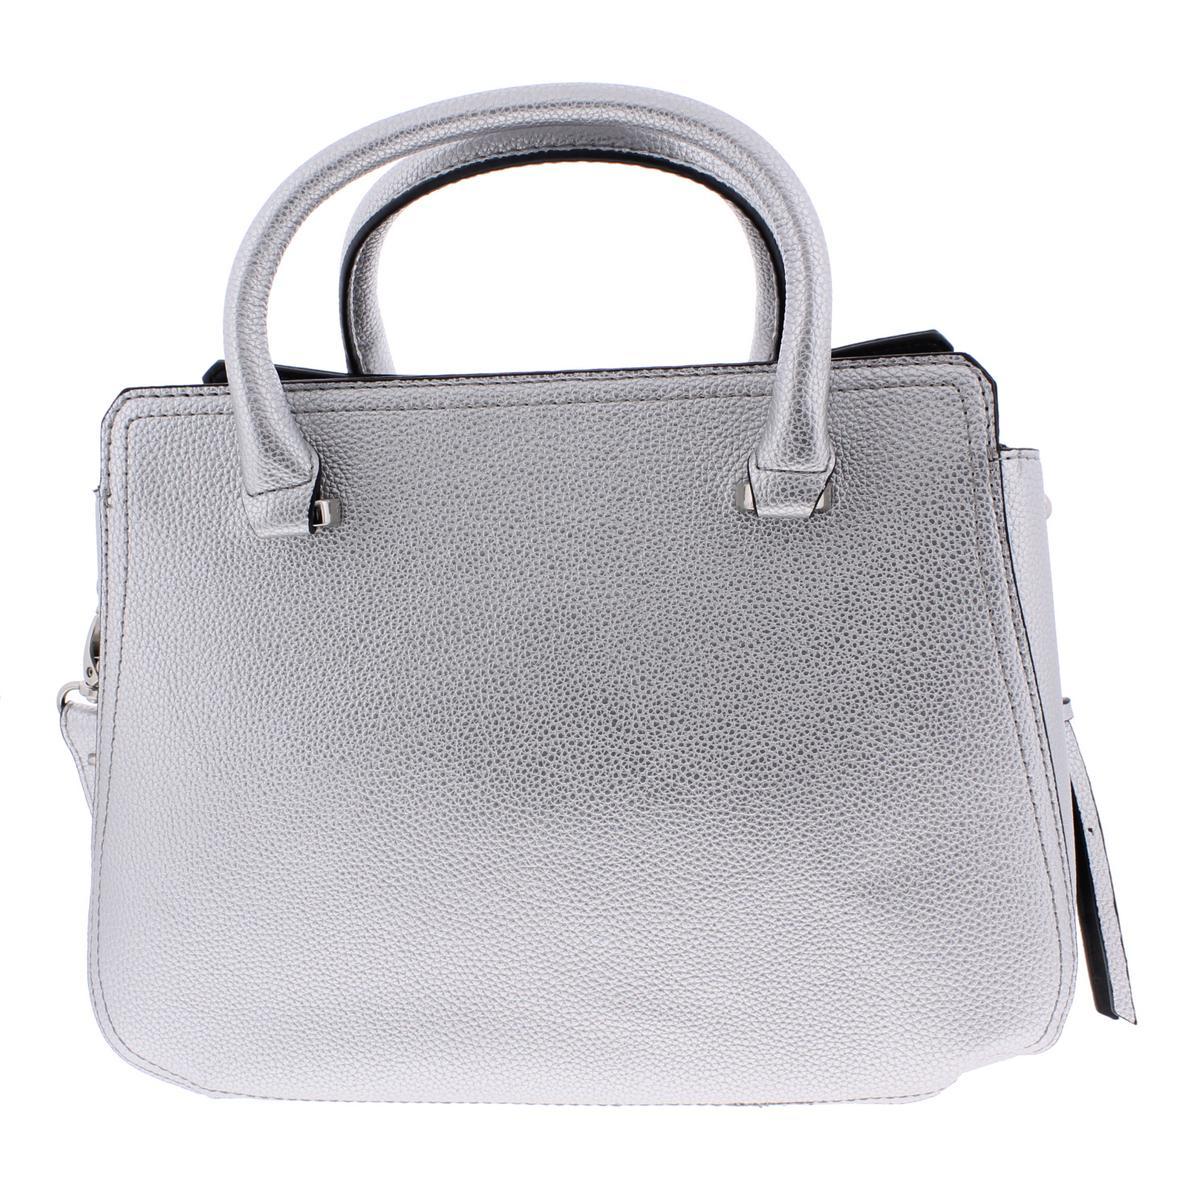 5c4b03c7d64a London Fog Womens Kate Signature Convertible Satchel Handbag Purse ...